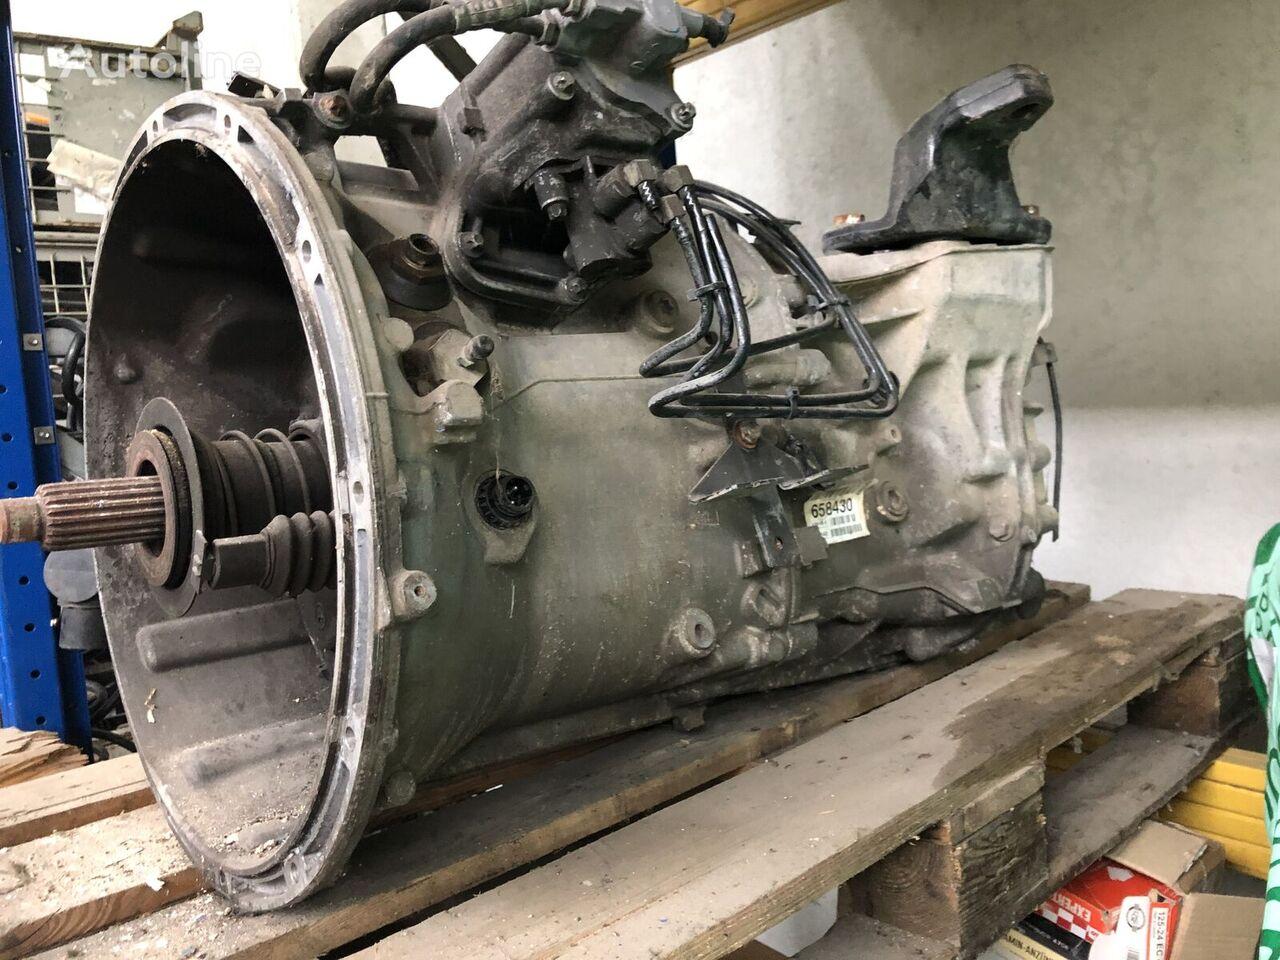 MERCEDES-BENZ Atego G131-9 Mechanisch gearbox for MERCEDES-BENZ Atego 24-29 tractor unit